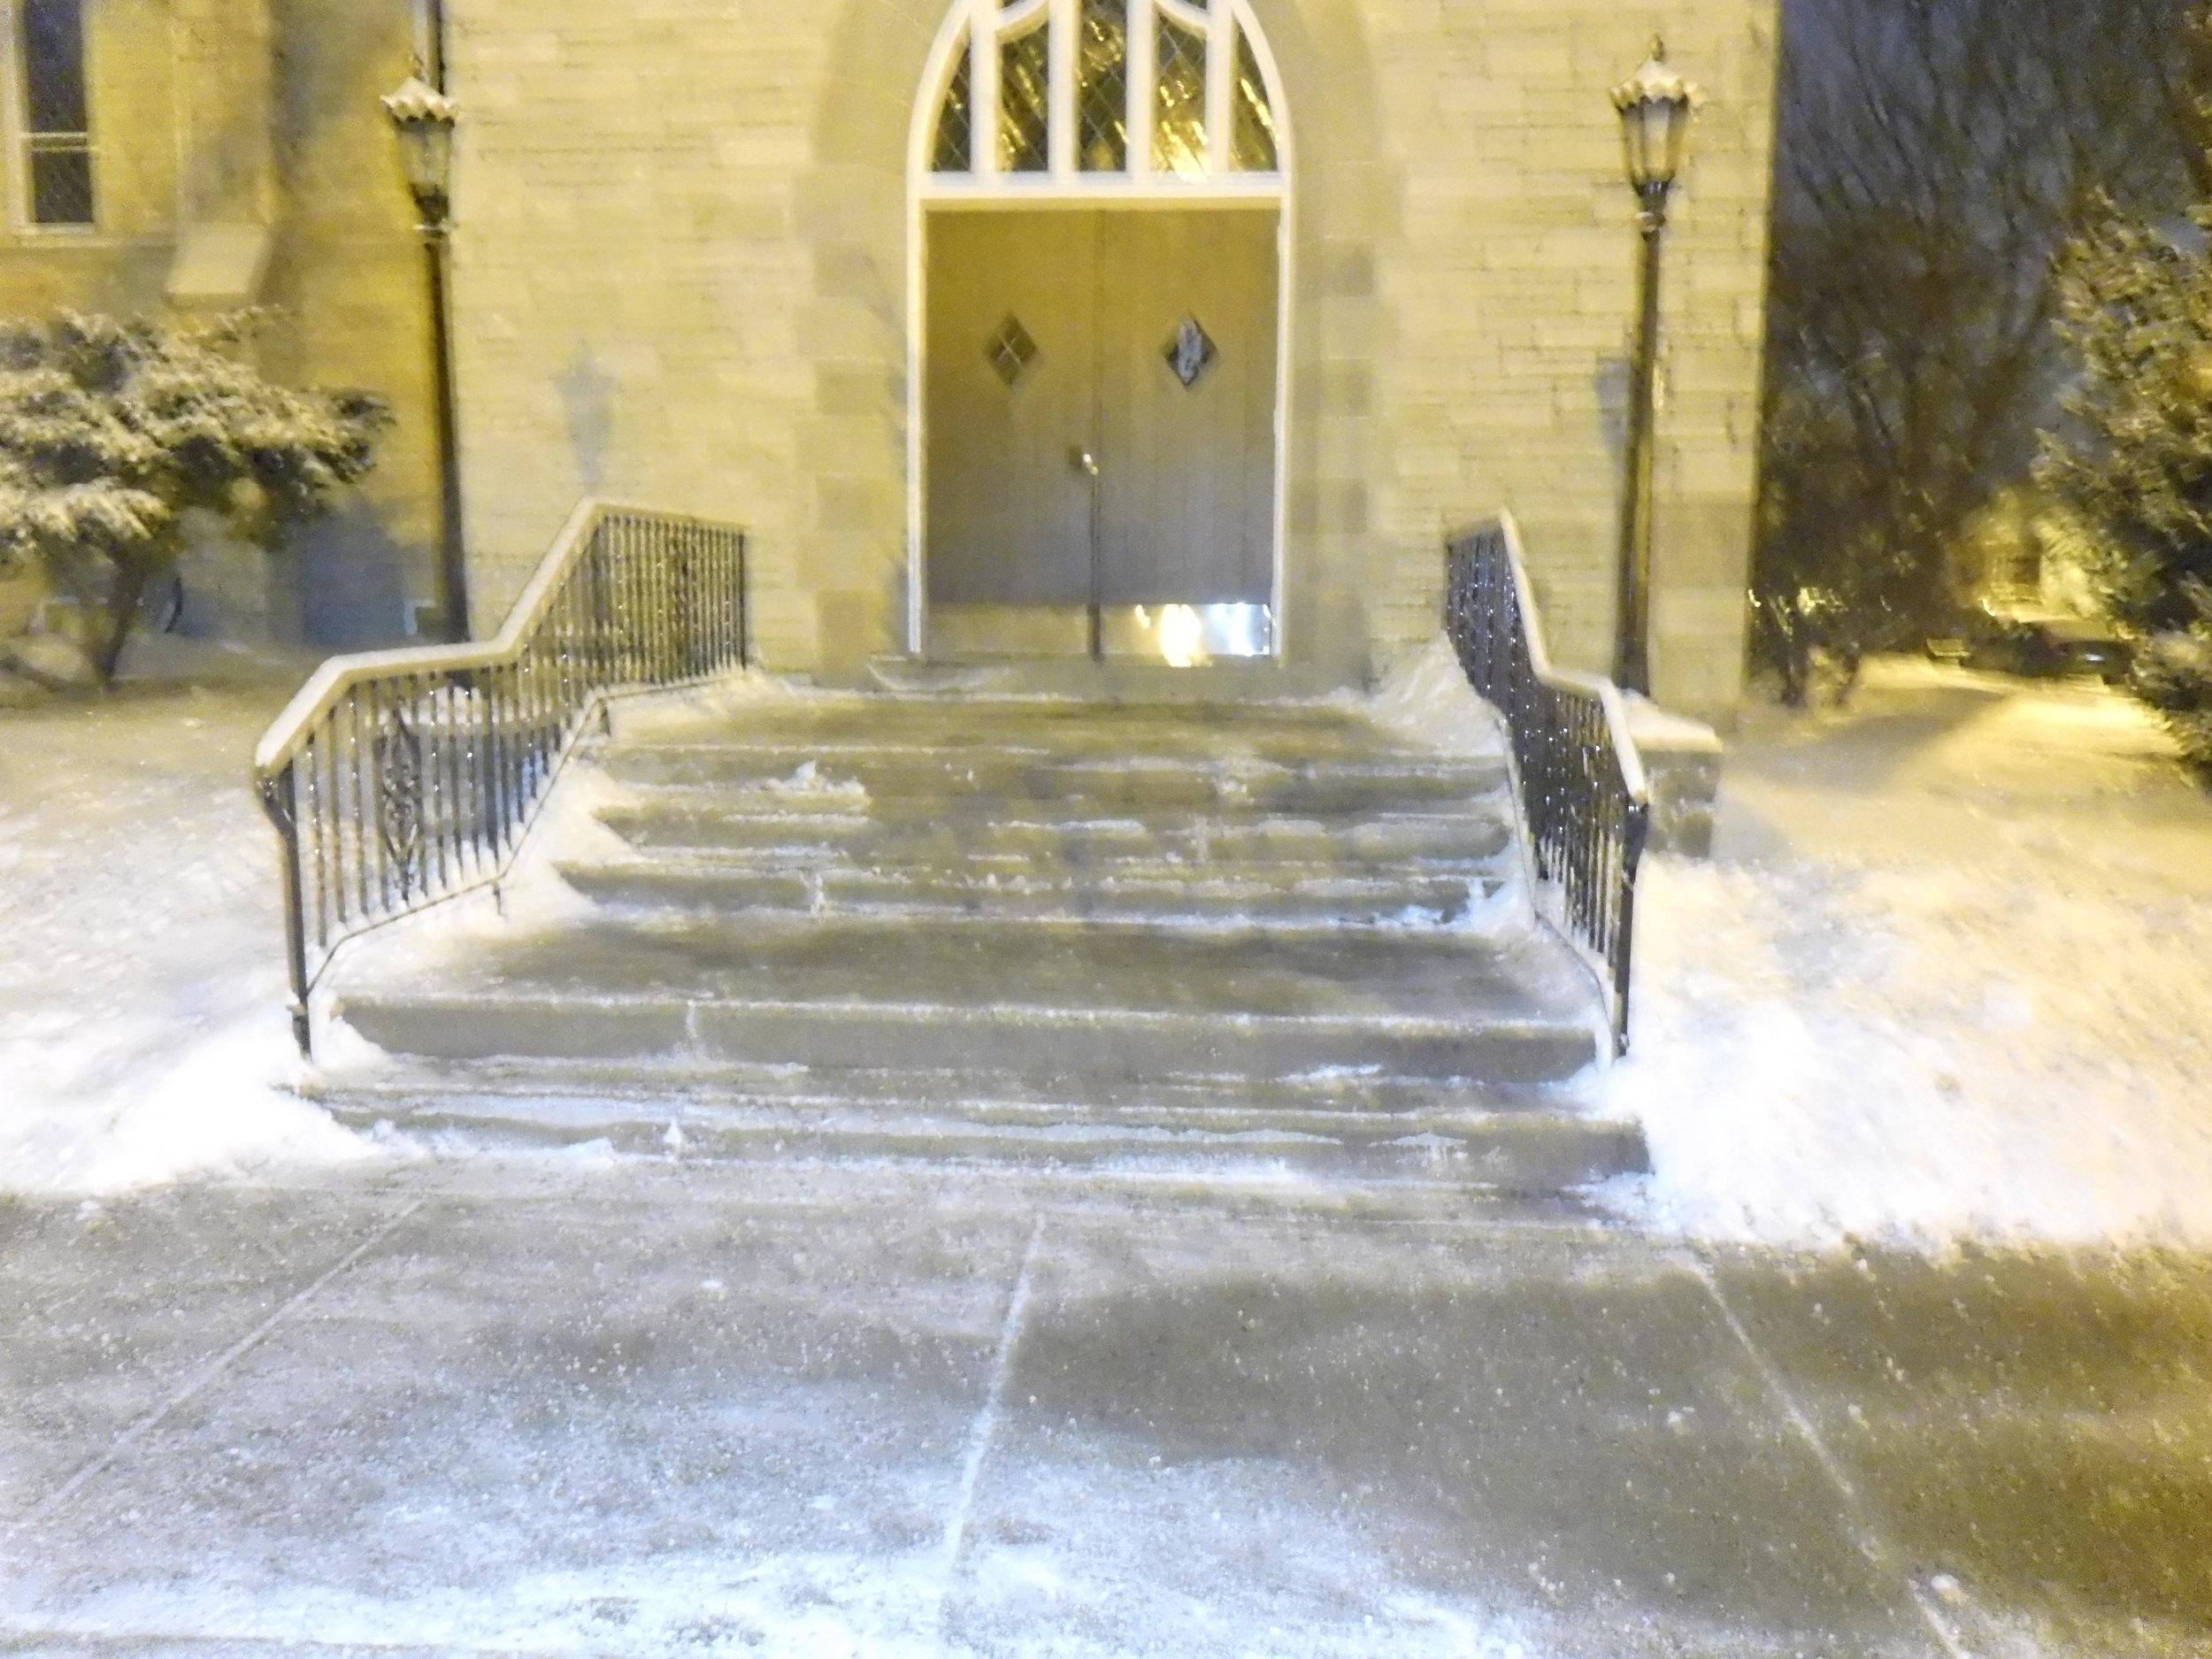 P1000565 after snowfall.JPG